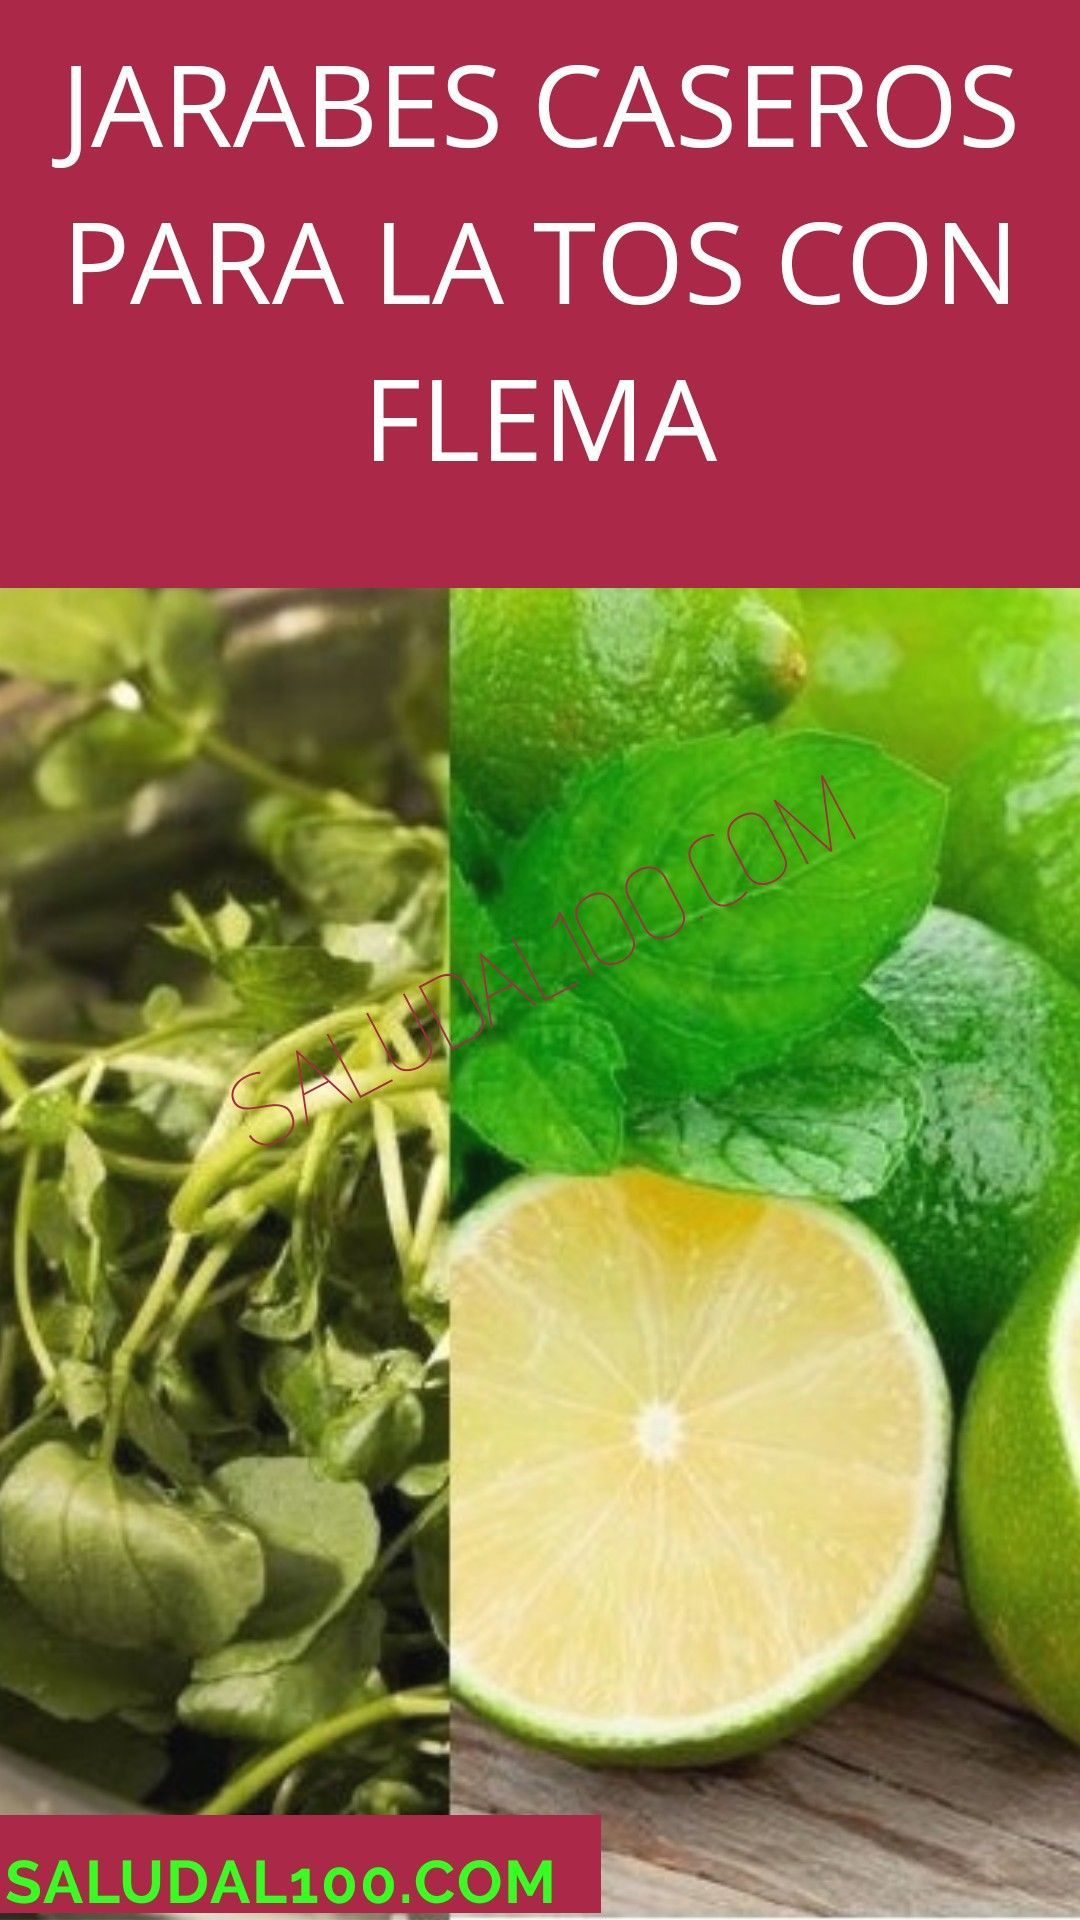 Jarabes Caseros Para La Tos Con Flema Jarabecasero Flemaytos Salud Herbalism Remedies Moringa